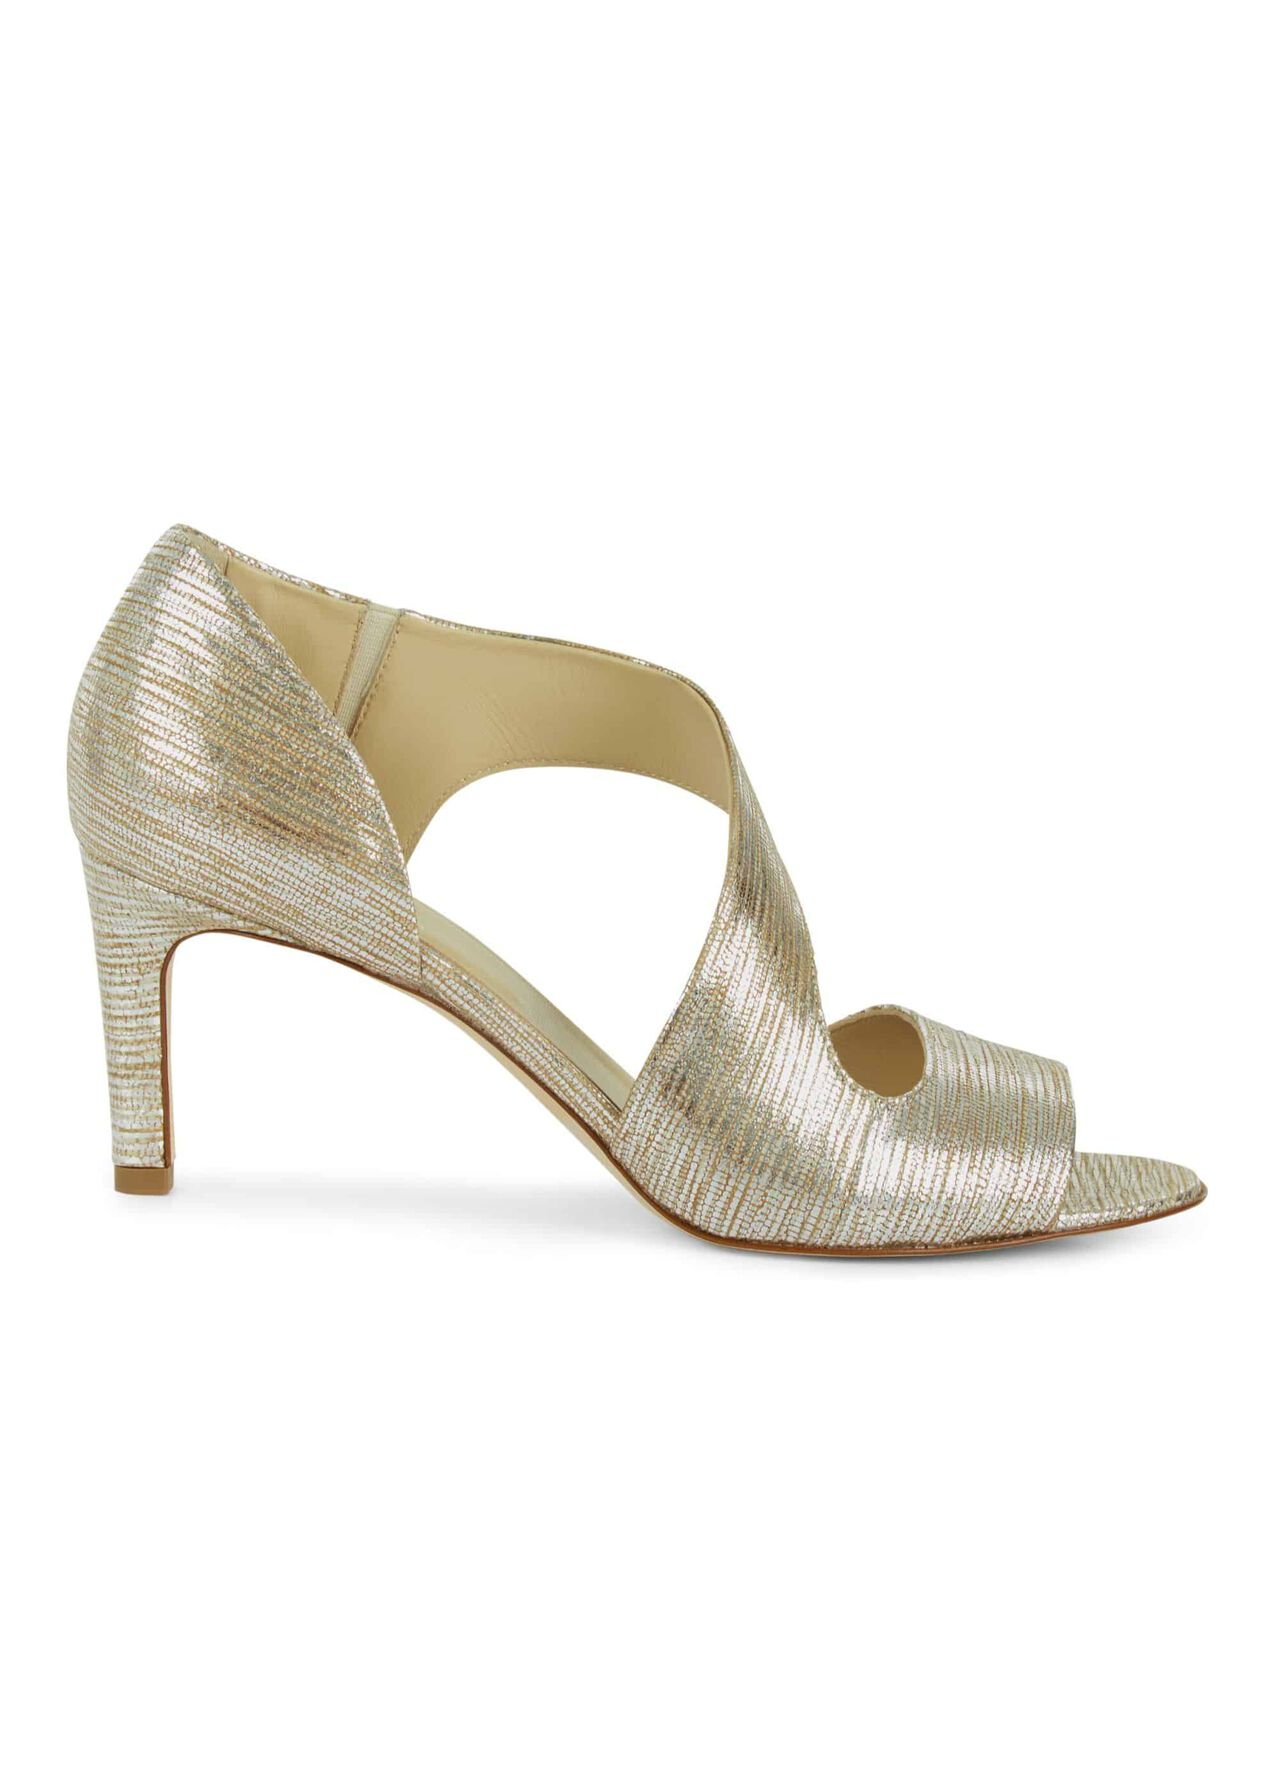 Lexi Sandal Gold Metallic